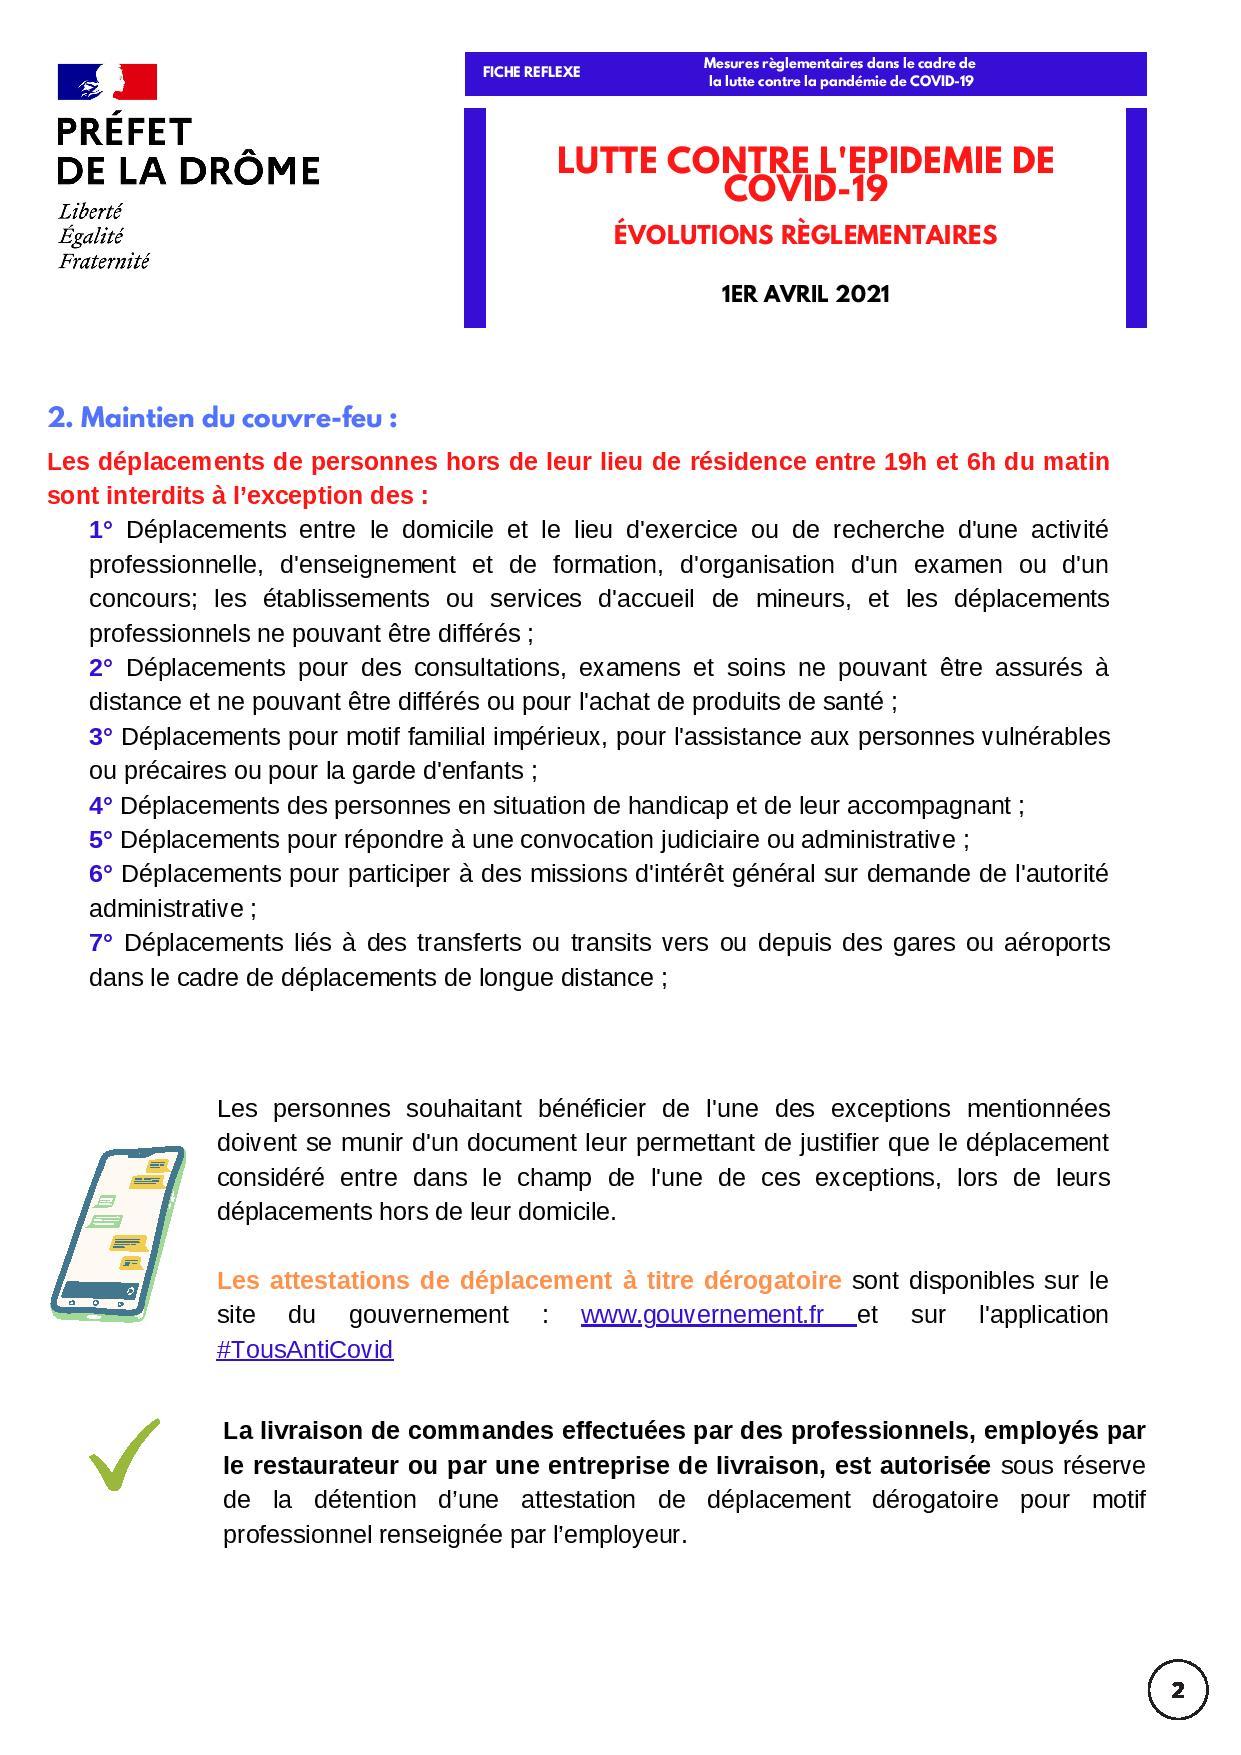 Fiche réflexe du 1er avril 2021-1-page-002.jpg